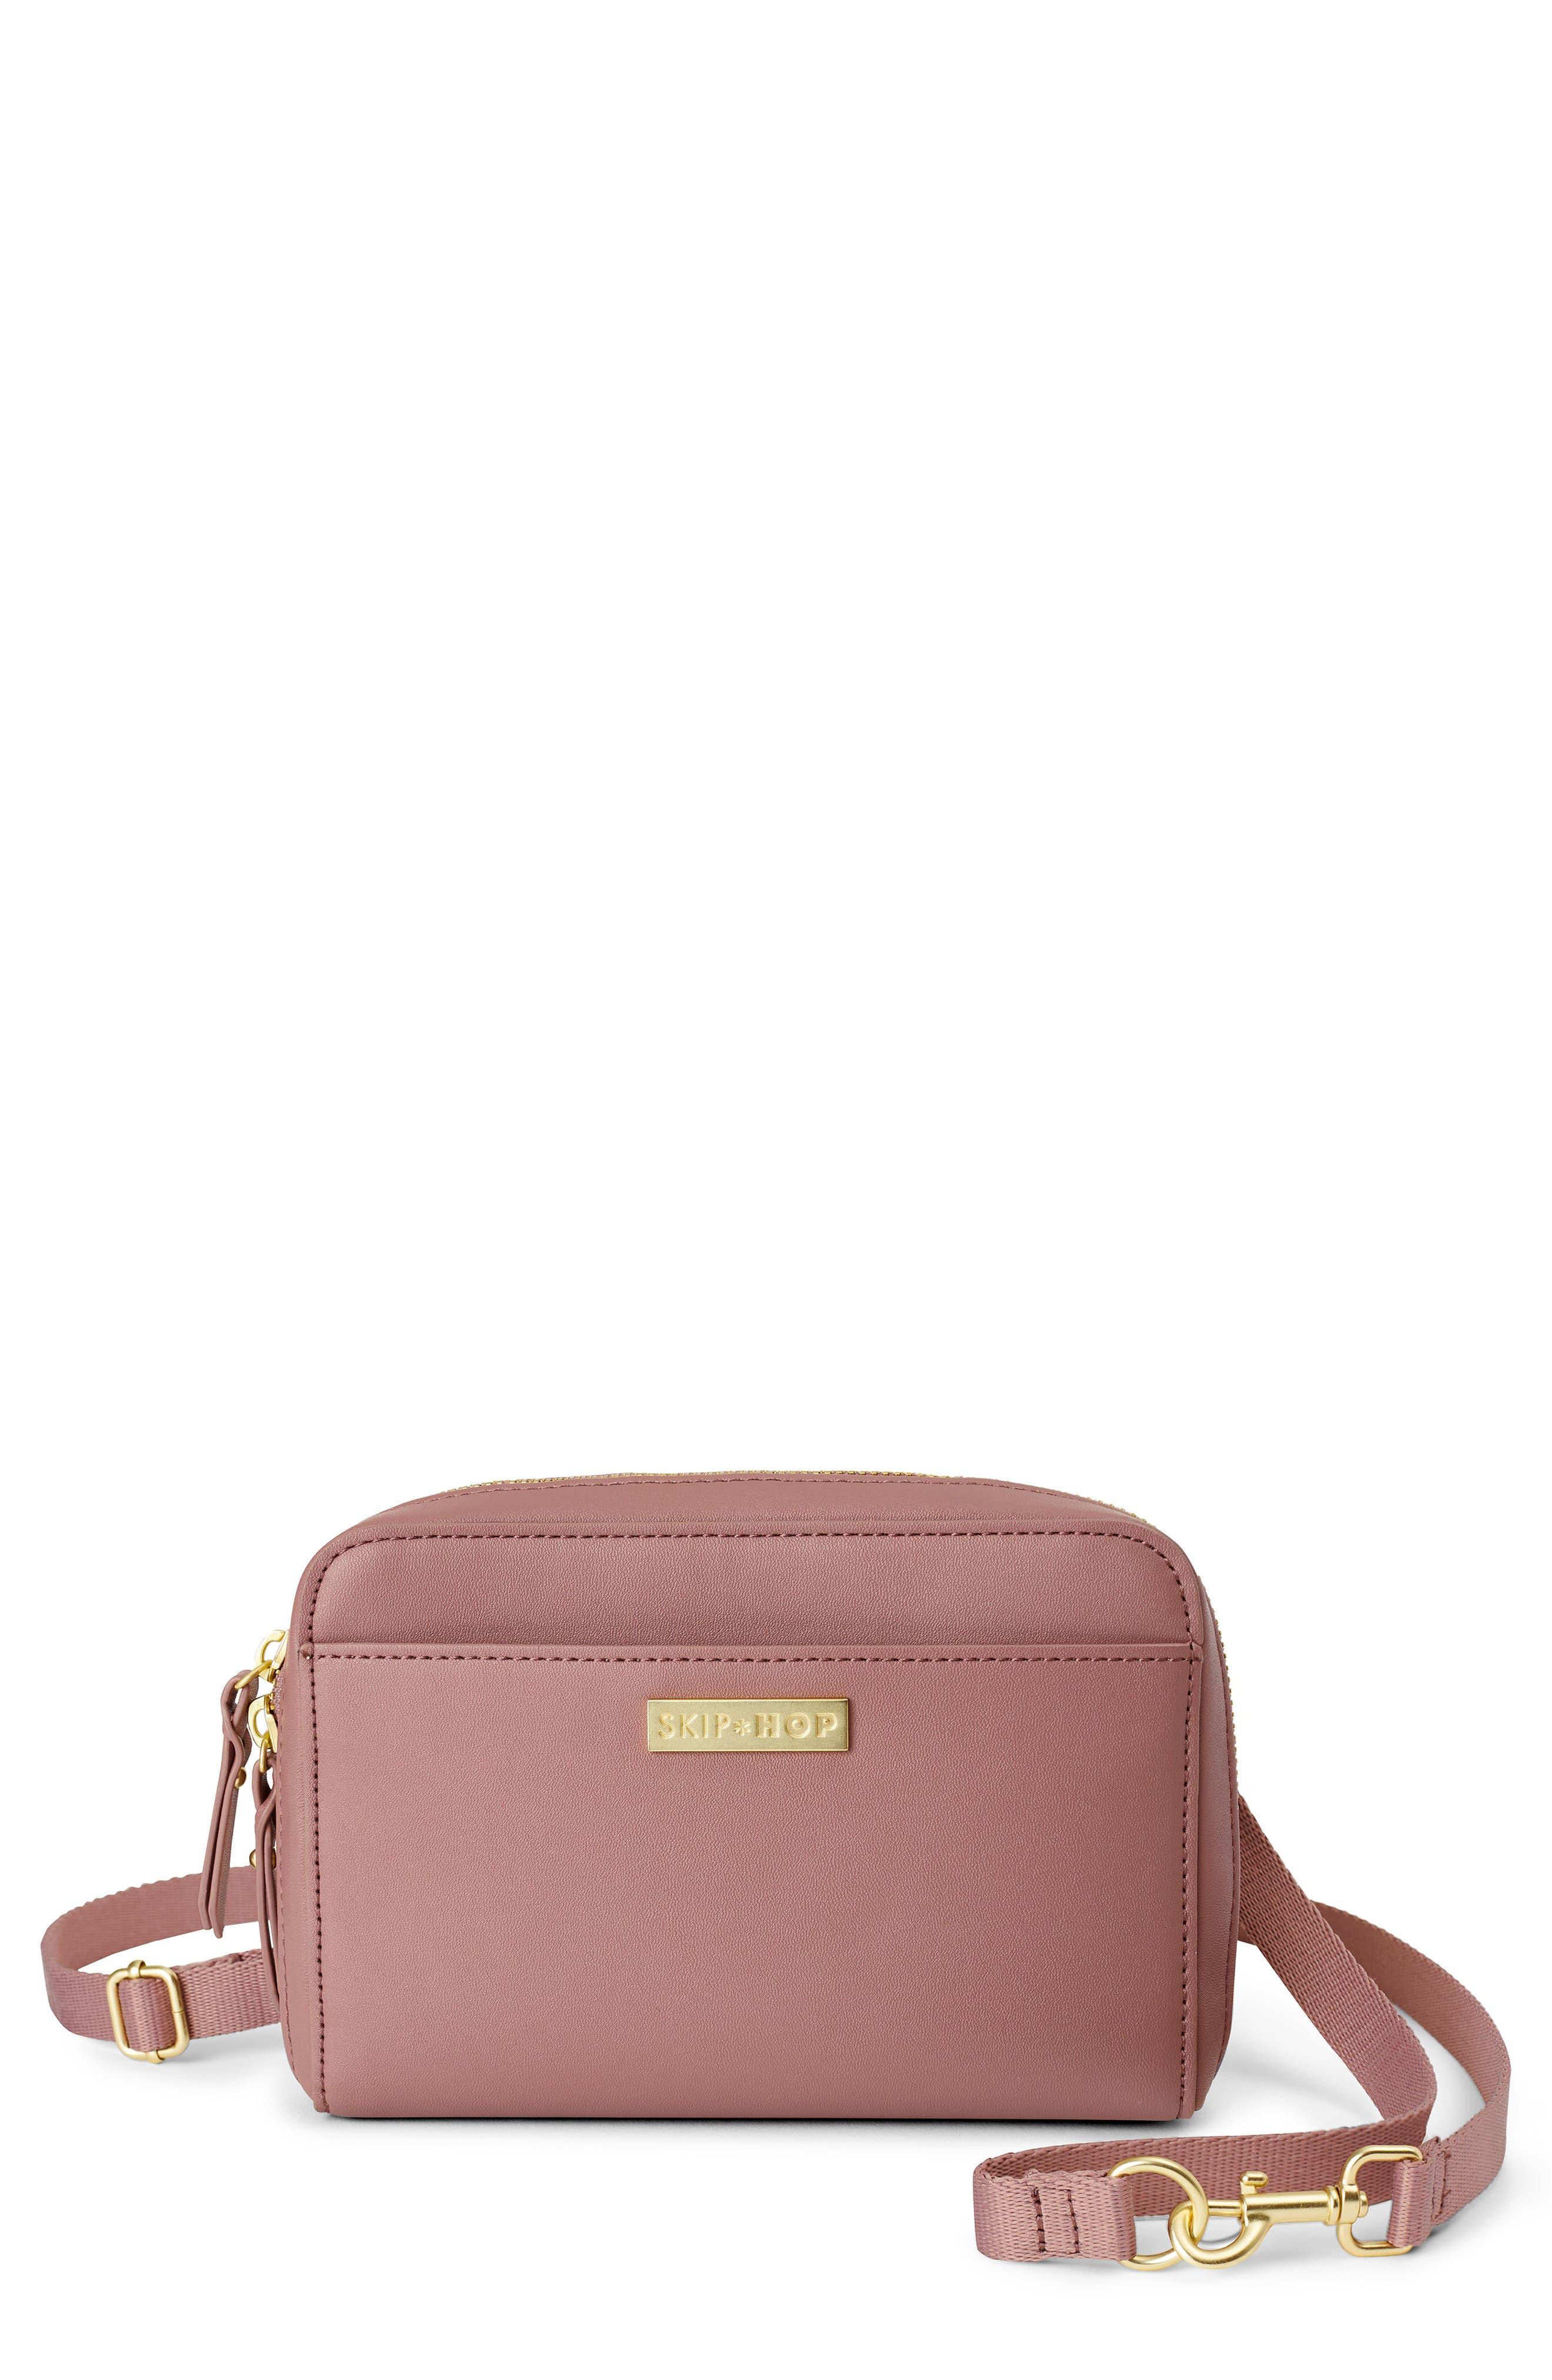 Infant Skip Hop Greenwich Convertible Diaper Belt Bag  Pink